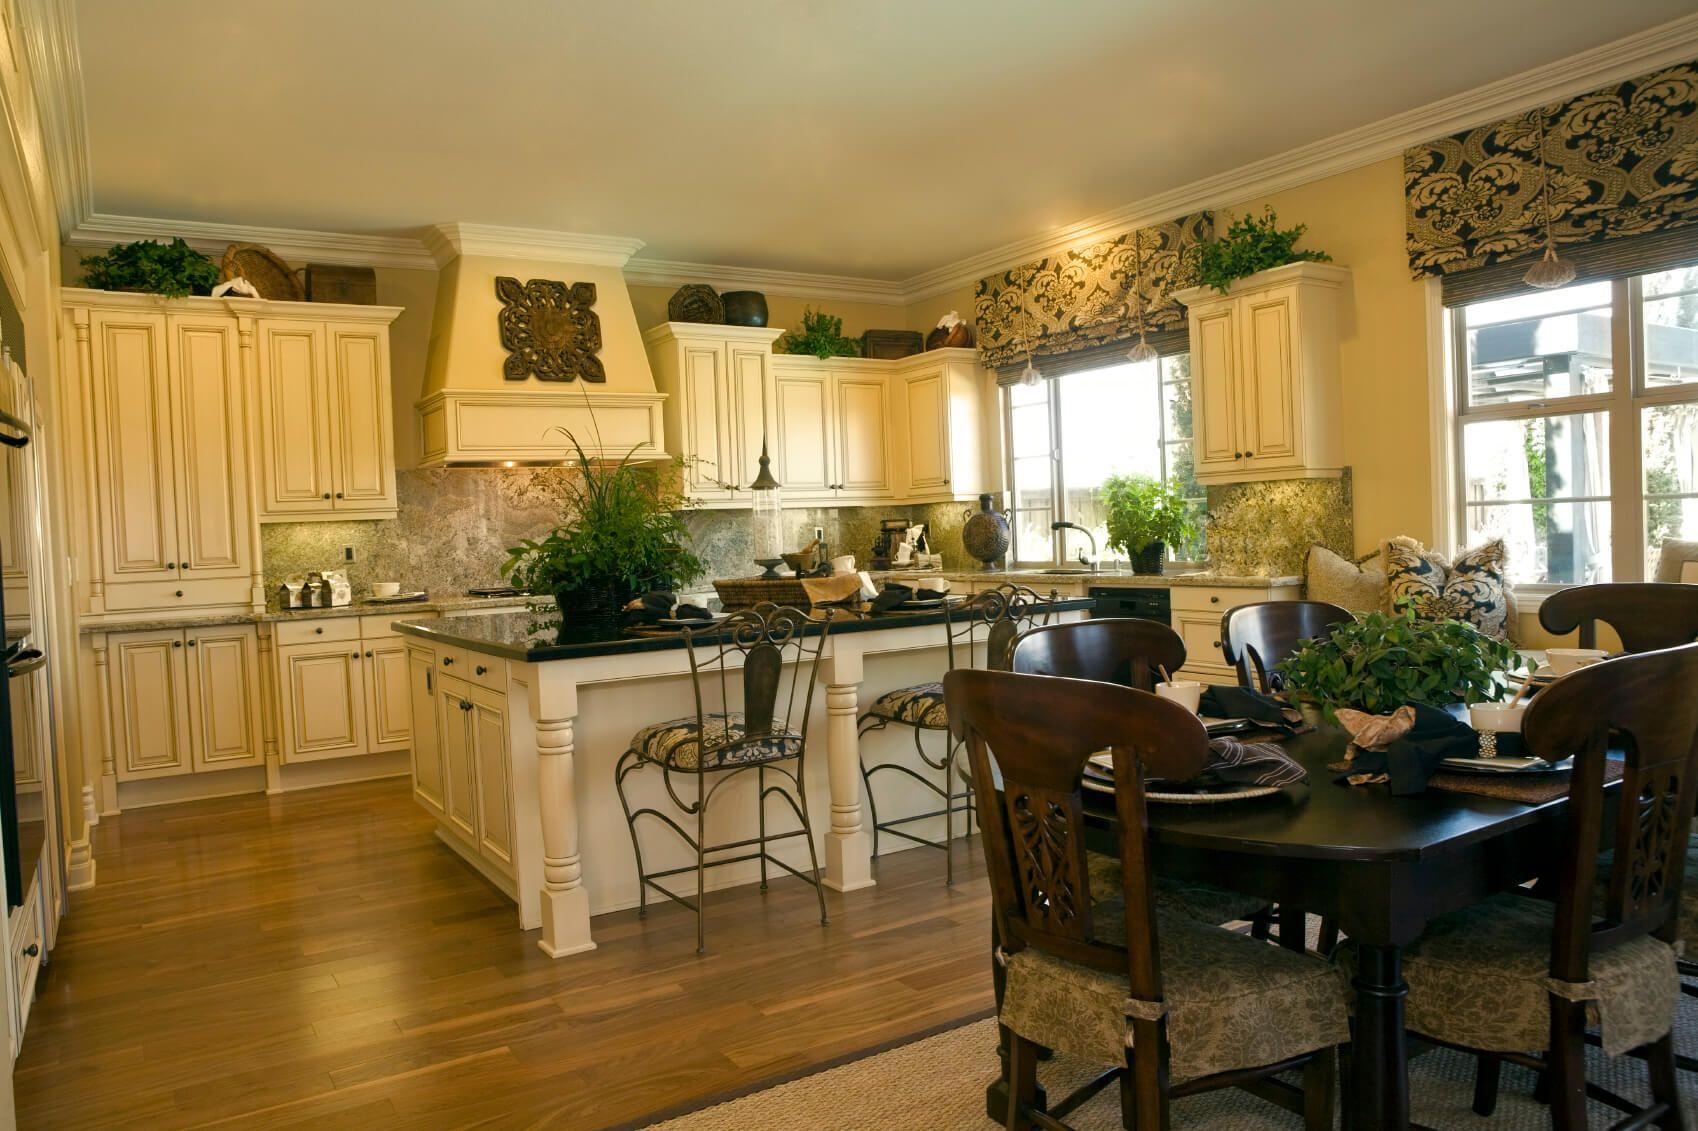 41 white kitchen interior design decor ideas pictures Kitchen Table Only Park Playground Table